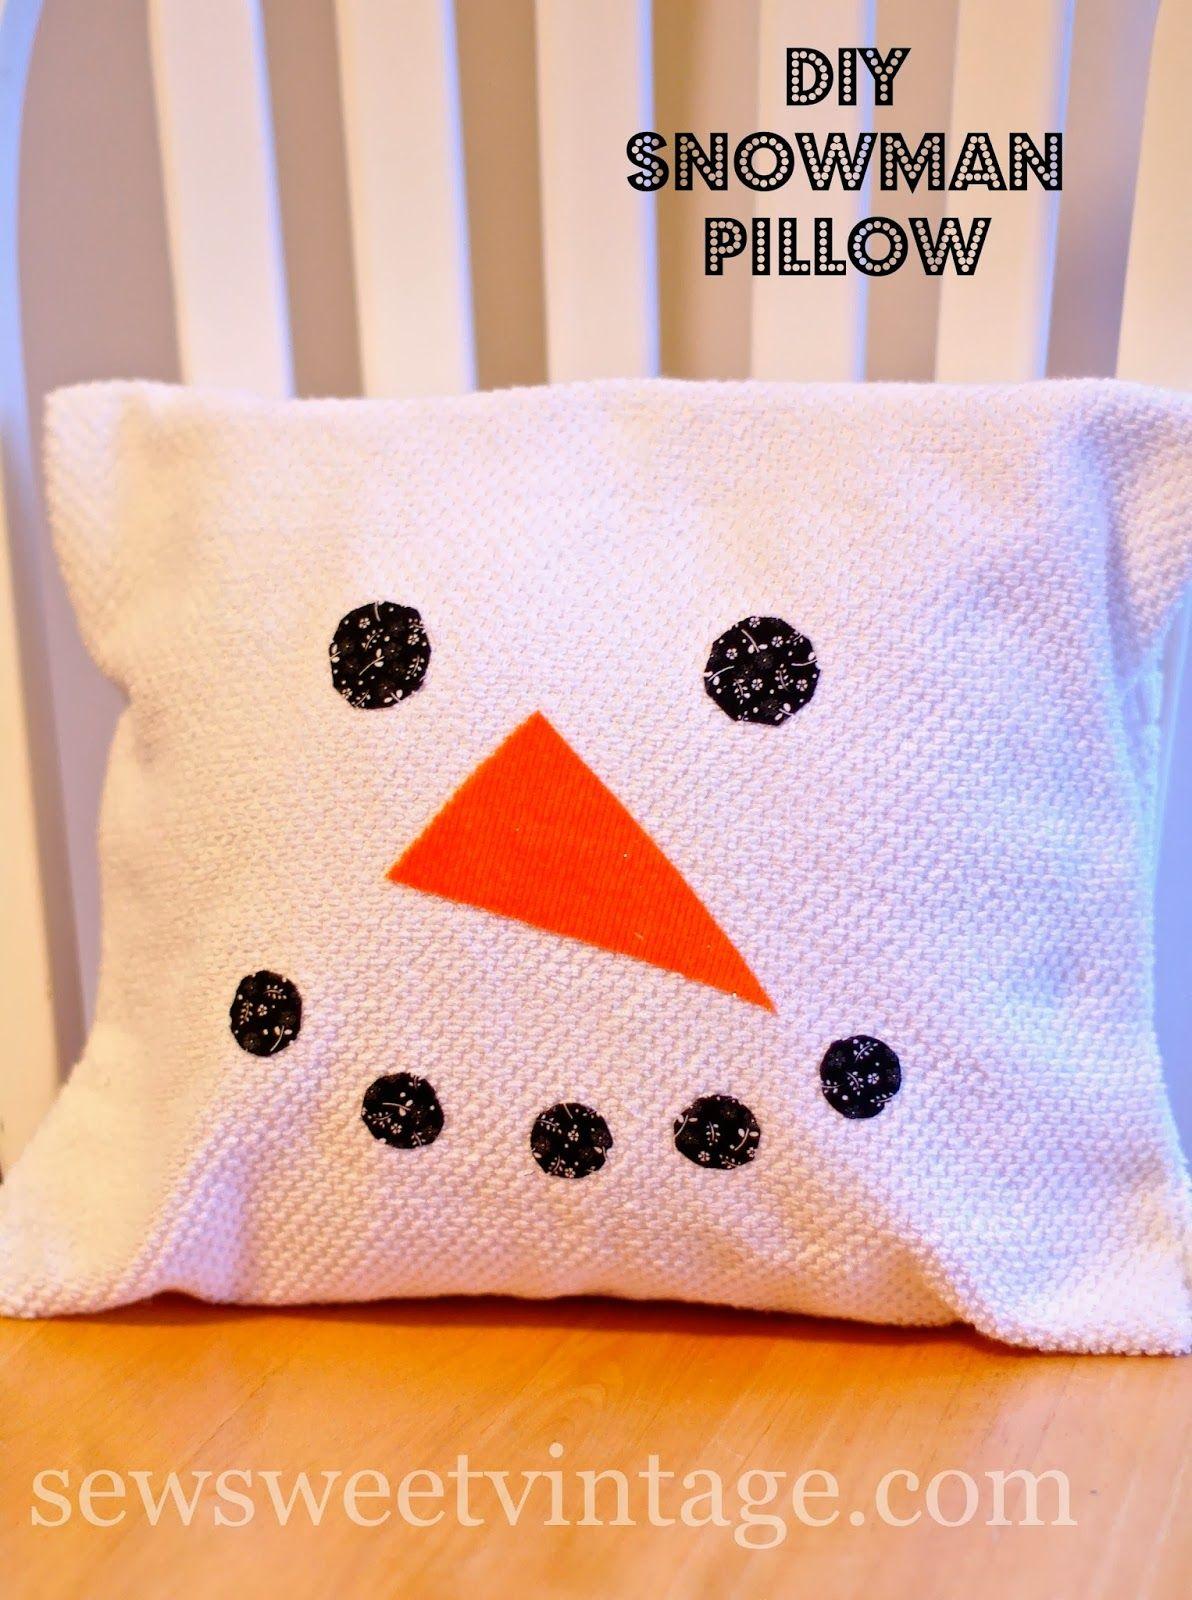 Sew sweet vintage diy dish towel pillow cover snowmen pinterest